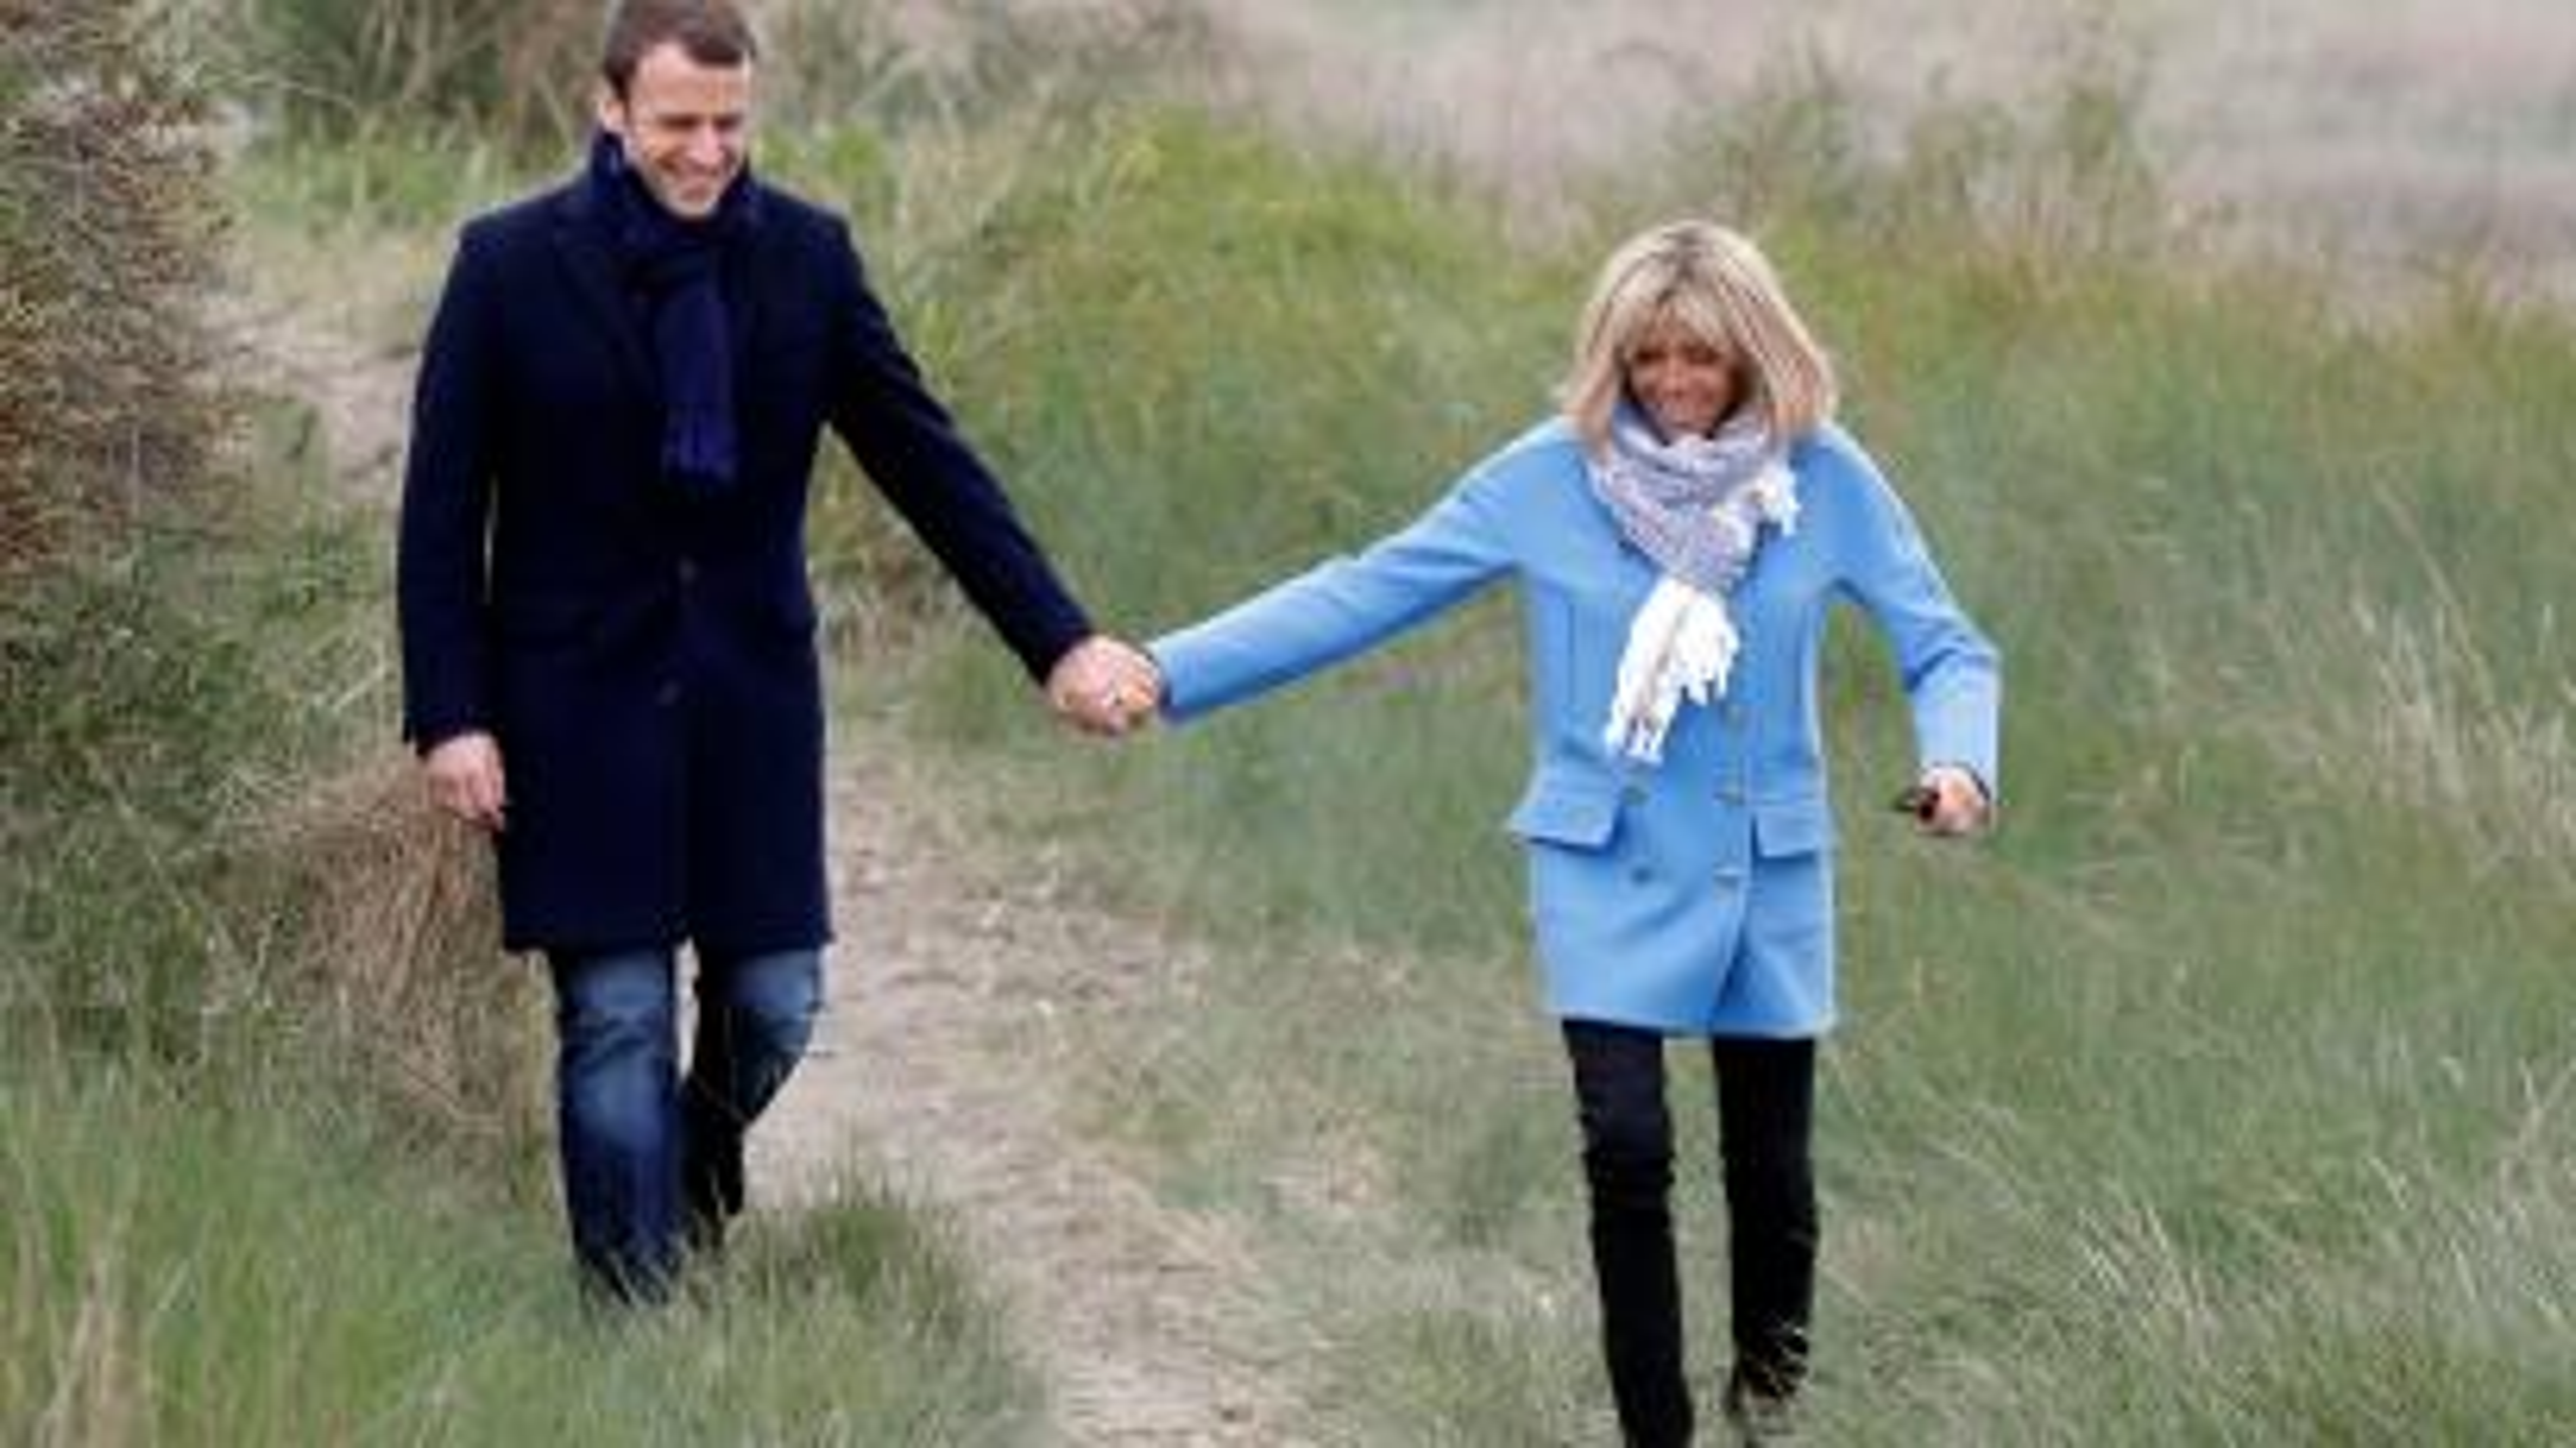 Emmanuel Macron Wedding.Emmanuel Macron S Wife Brigitte Macron Who Is 24 Years His Senior